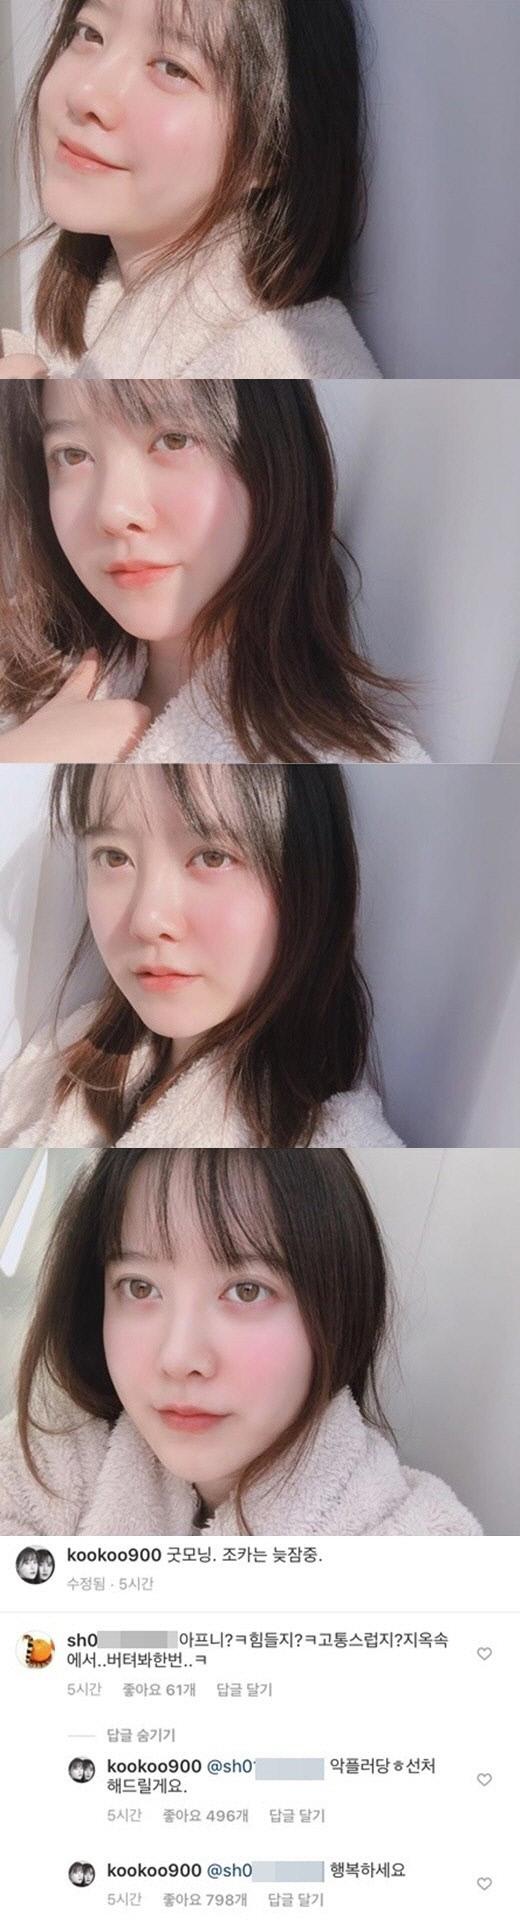 "[SNS는 지금] ""행복하세요""…구혜선, 도 넘은 악플러마저 선처"